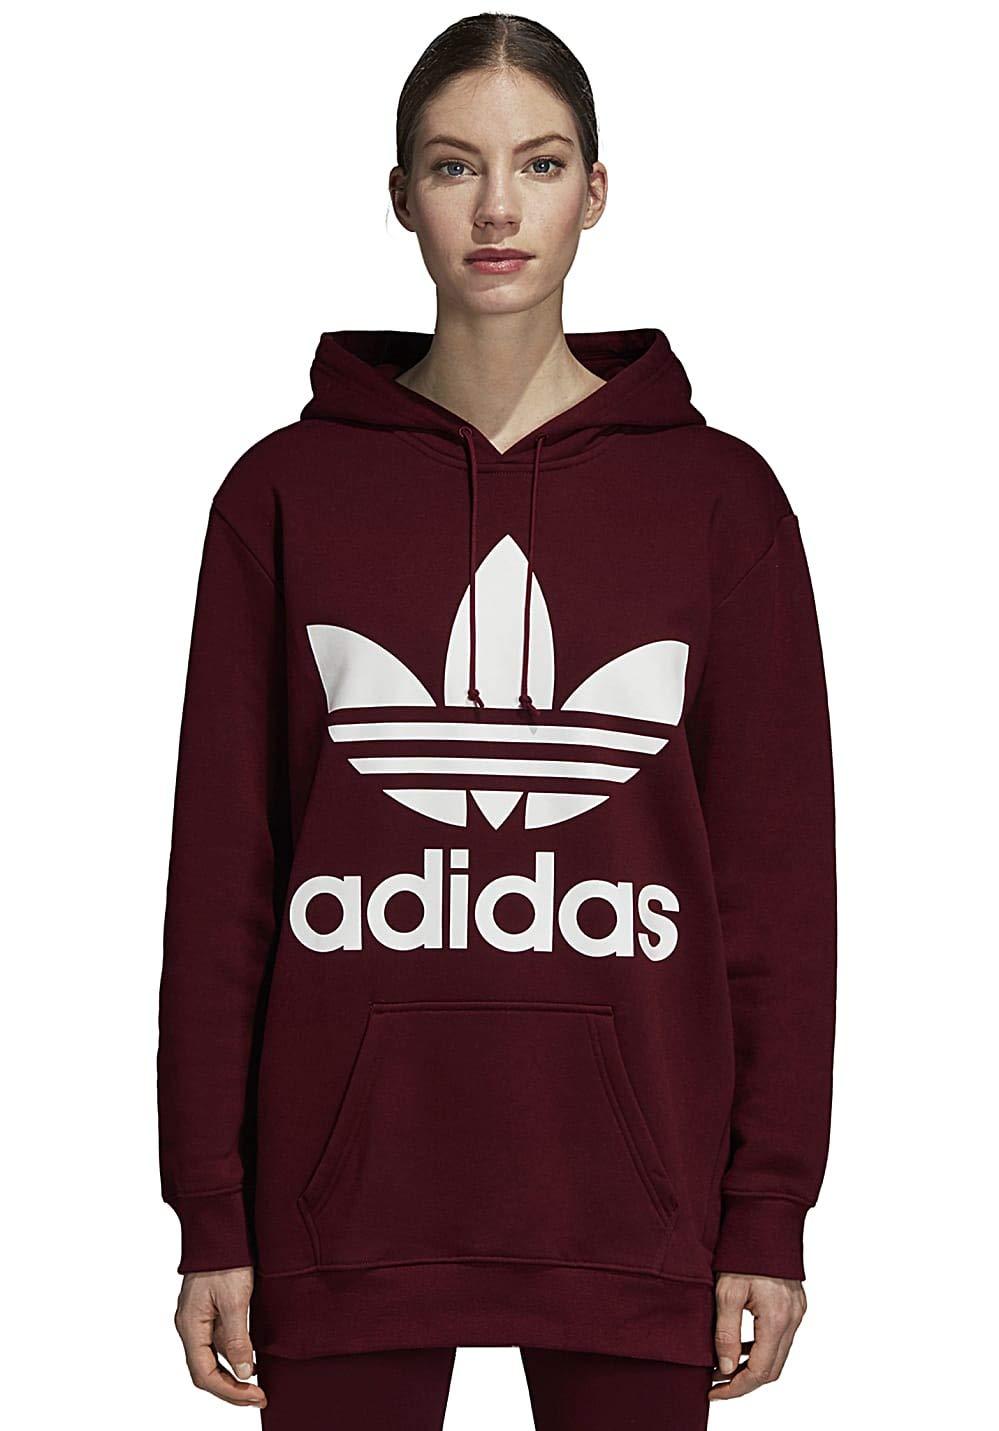 adidas Women BF TRF HOODIE, HOODED Sweatshirt, women's women's DH3152